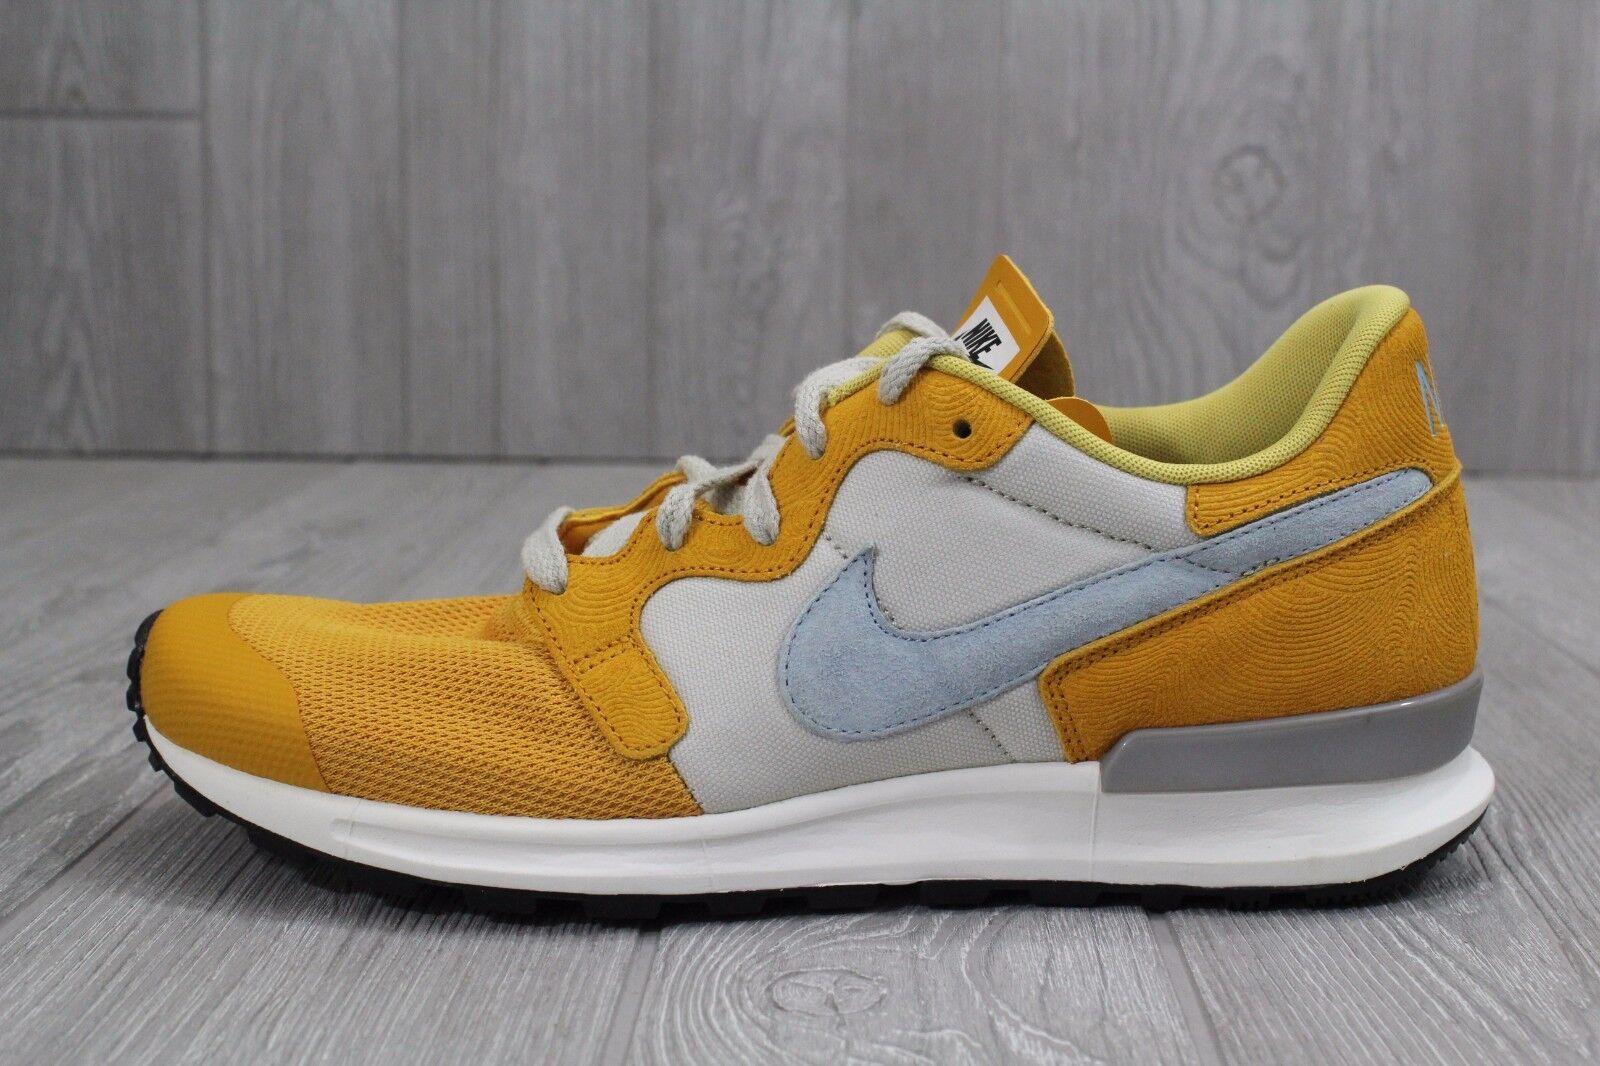 24 New Nike Air Berwuda Premium Gold 844978 Leaf Bone Men's Shoe 844978 Gold 700 Size 10.5 5e4fed